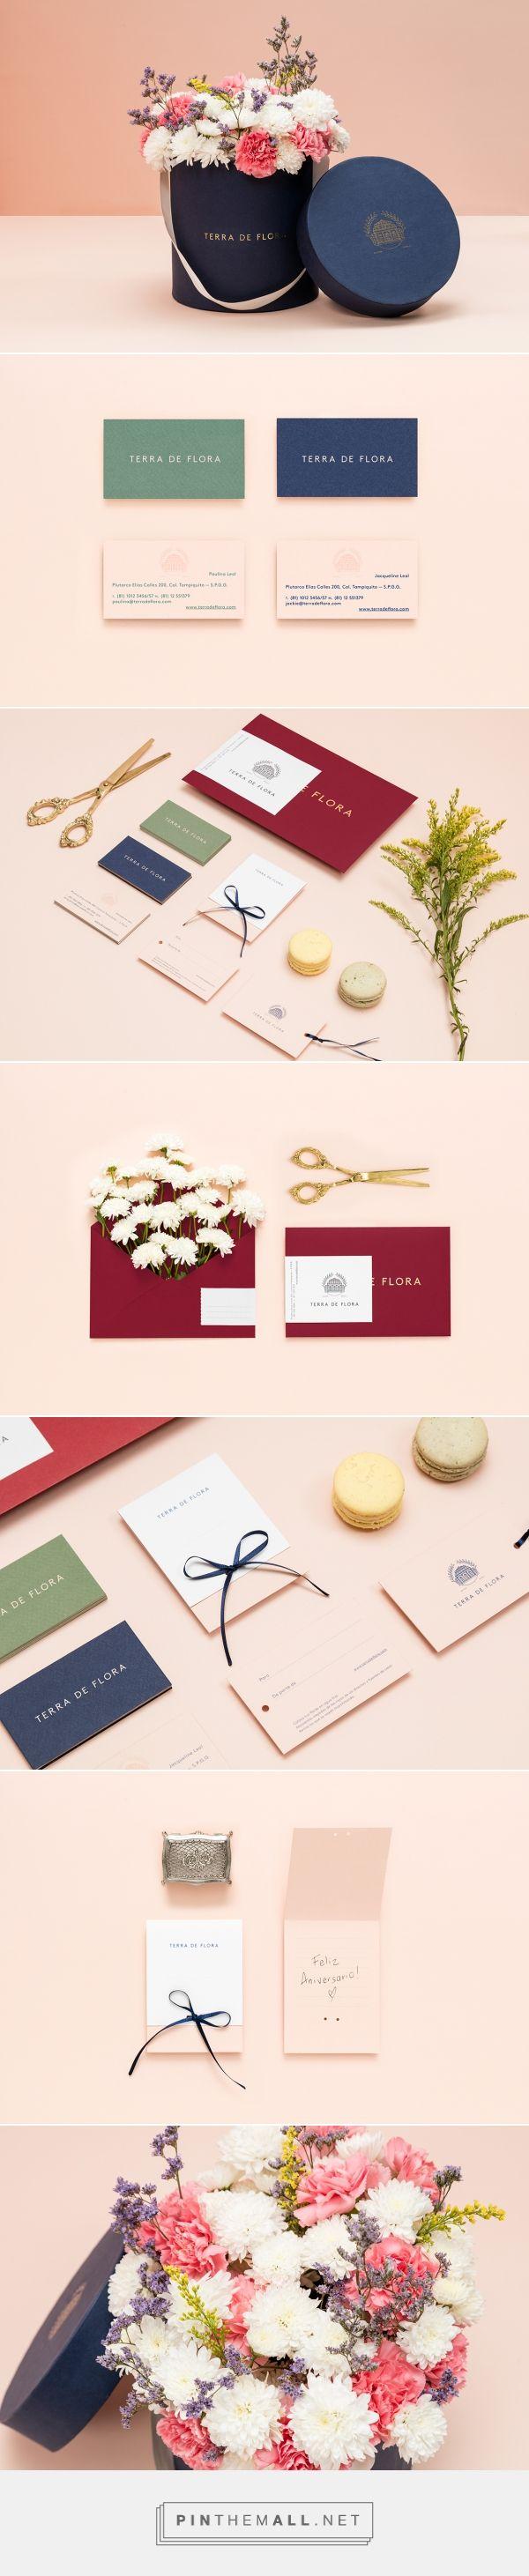 The Design Blog - Design Inspiration - created via https://pinthemall.net